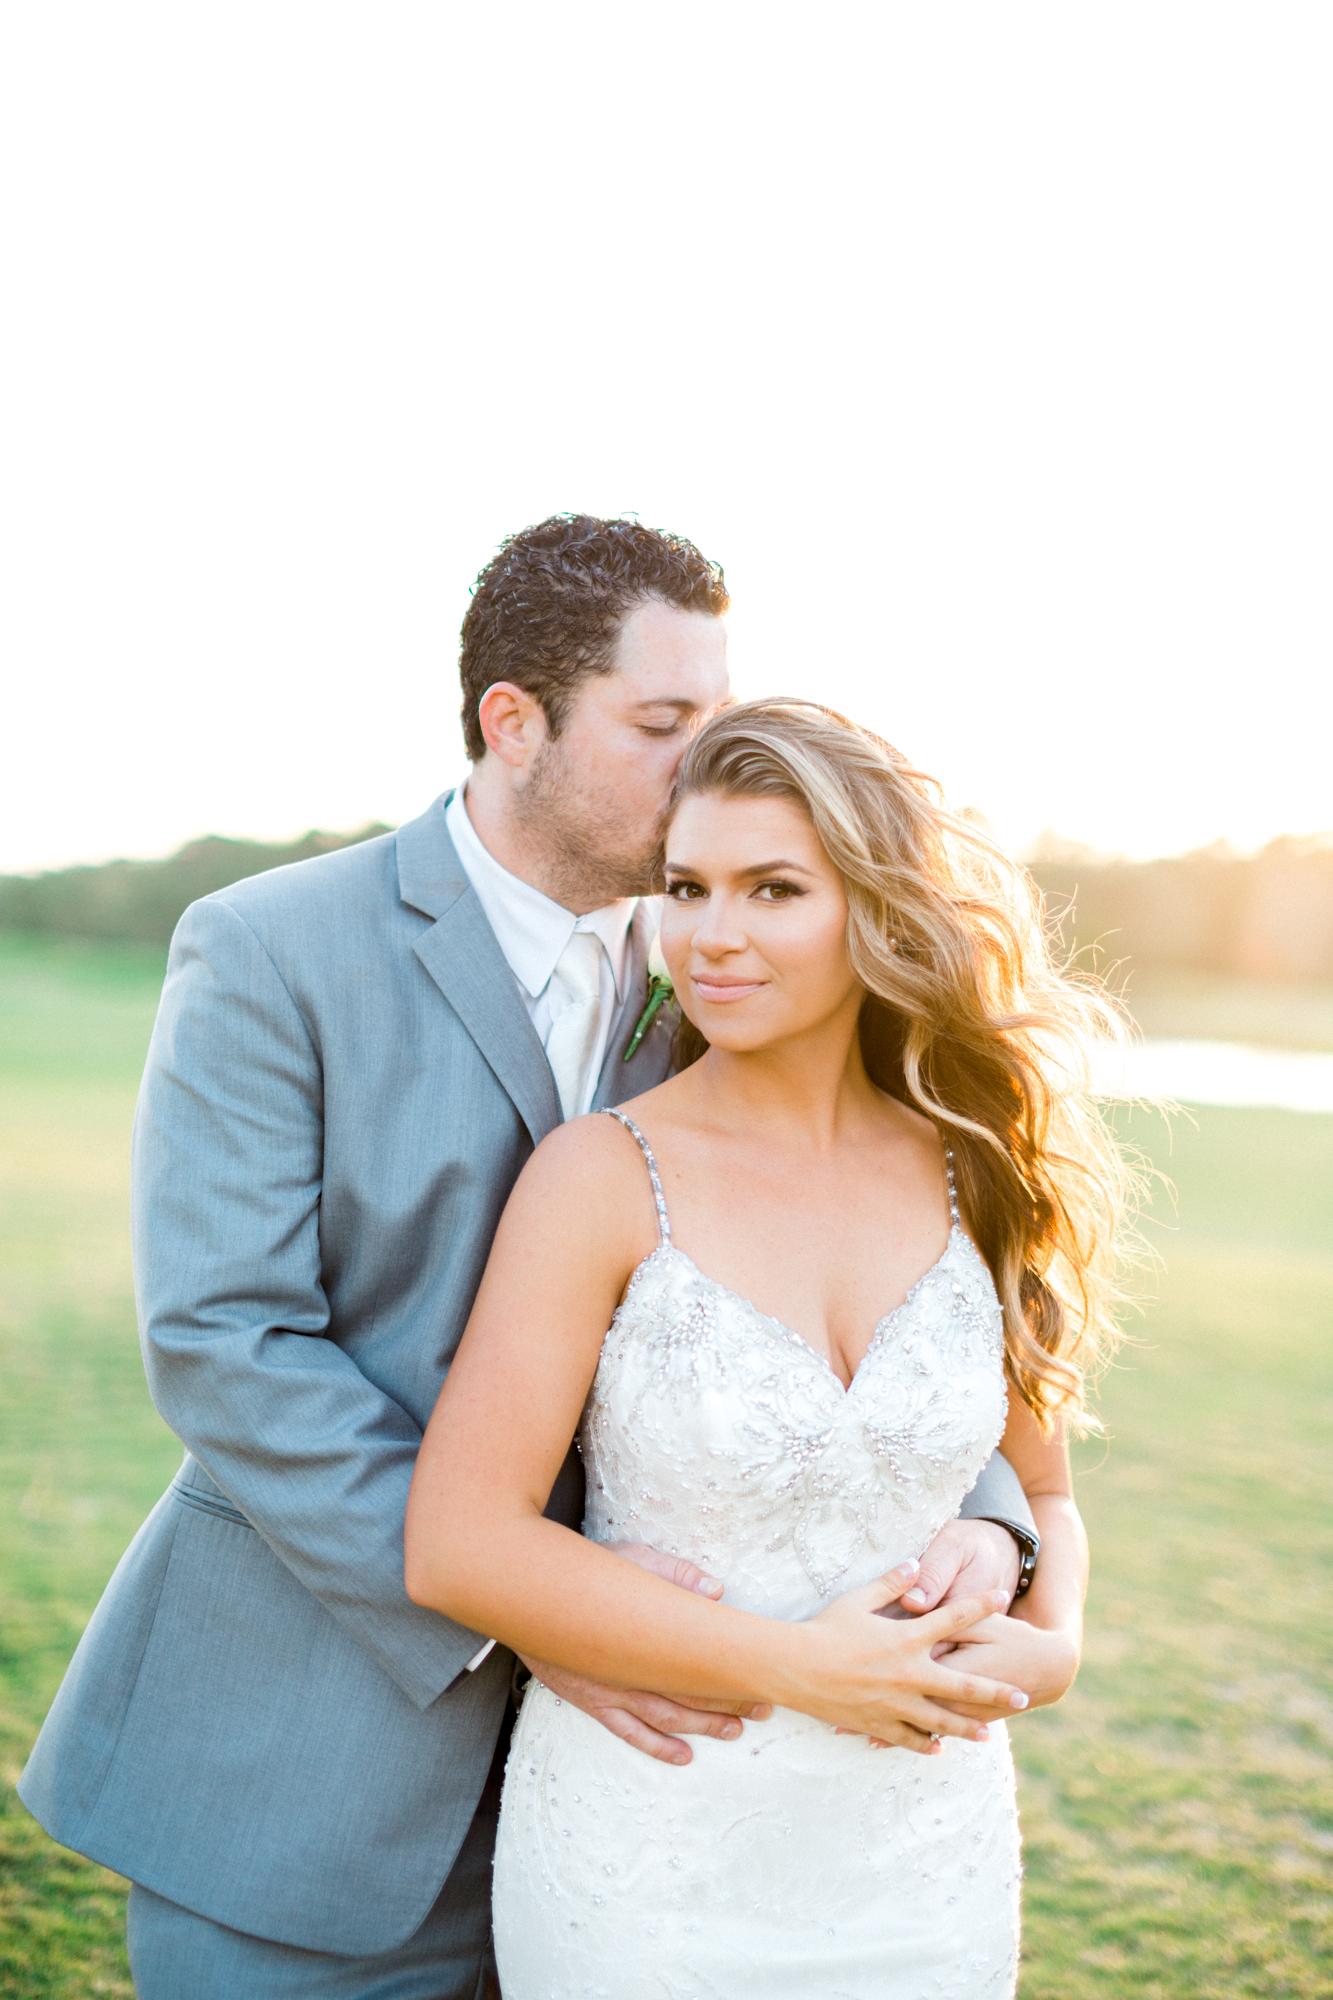 jessica-bellinger-photography-harmony-golf-preserve-wedding-photos-9390.jpg